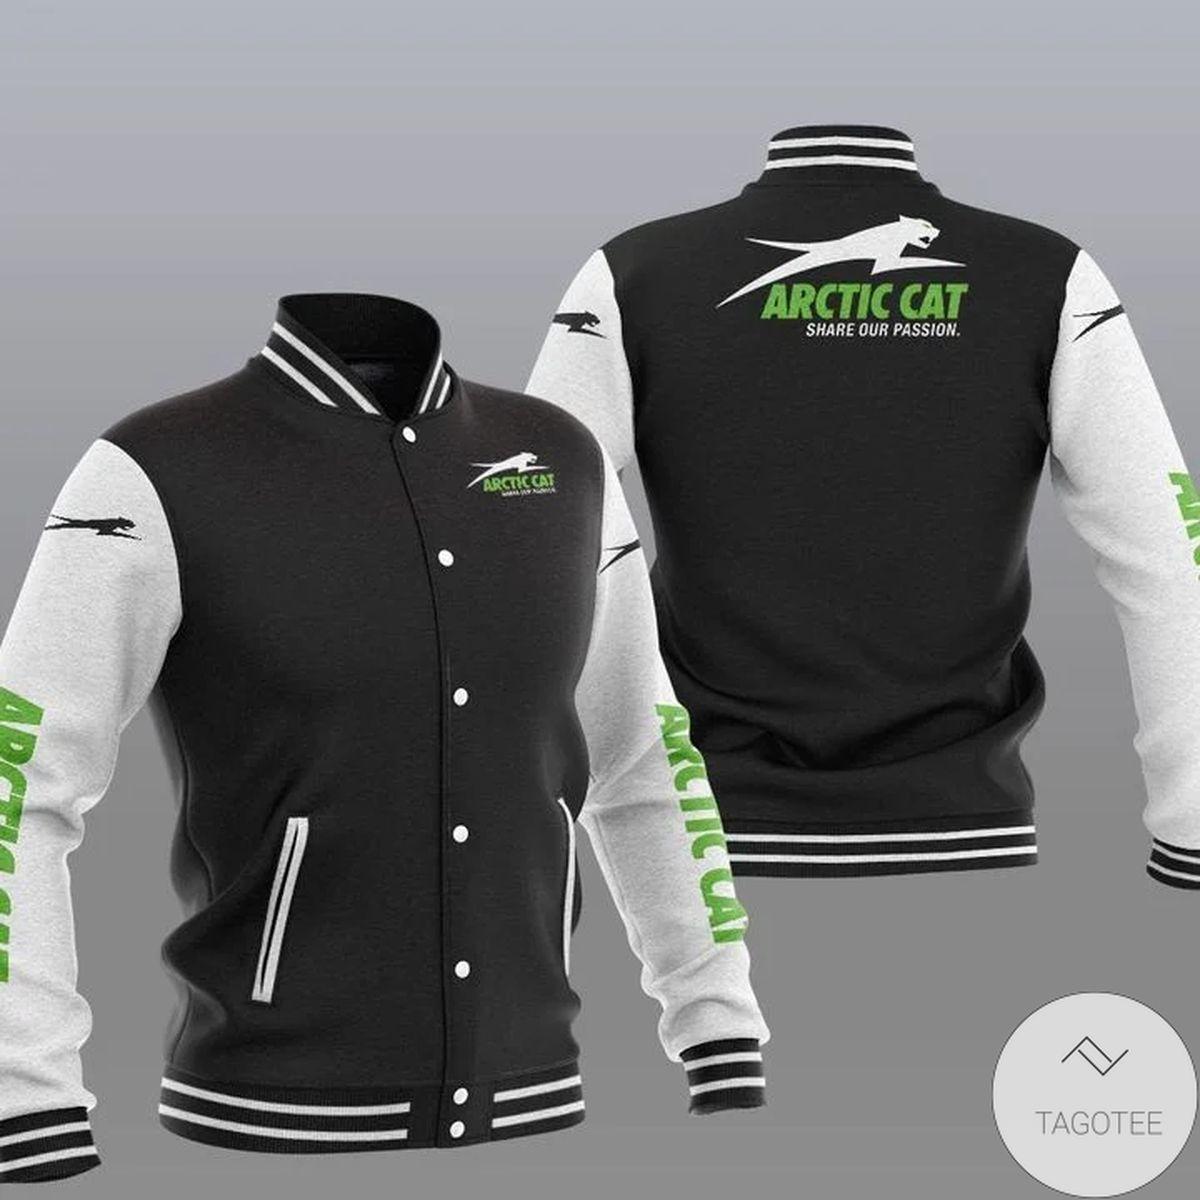 Hot Deal Arctic Cat Varsity Baseball Jacket